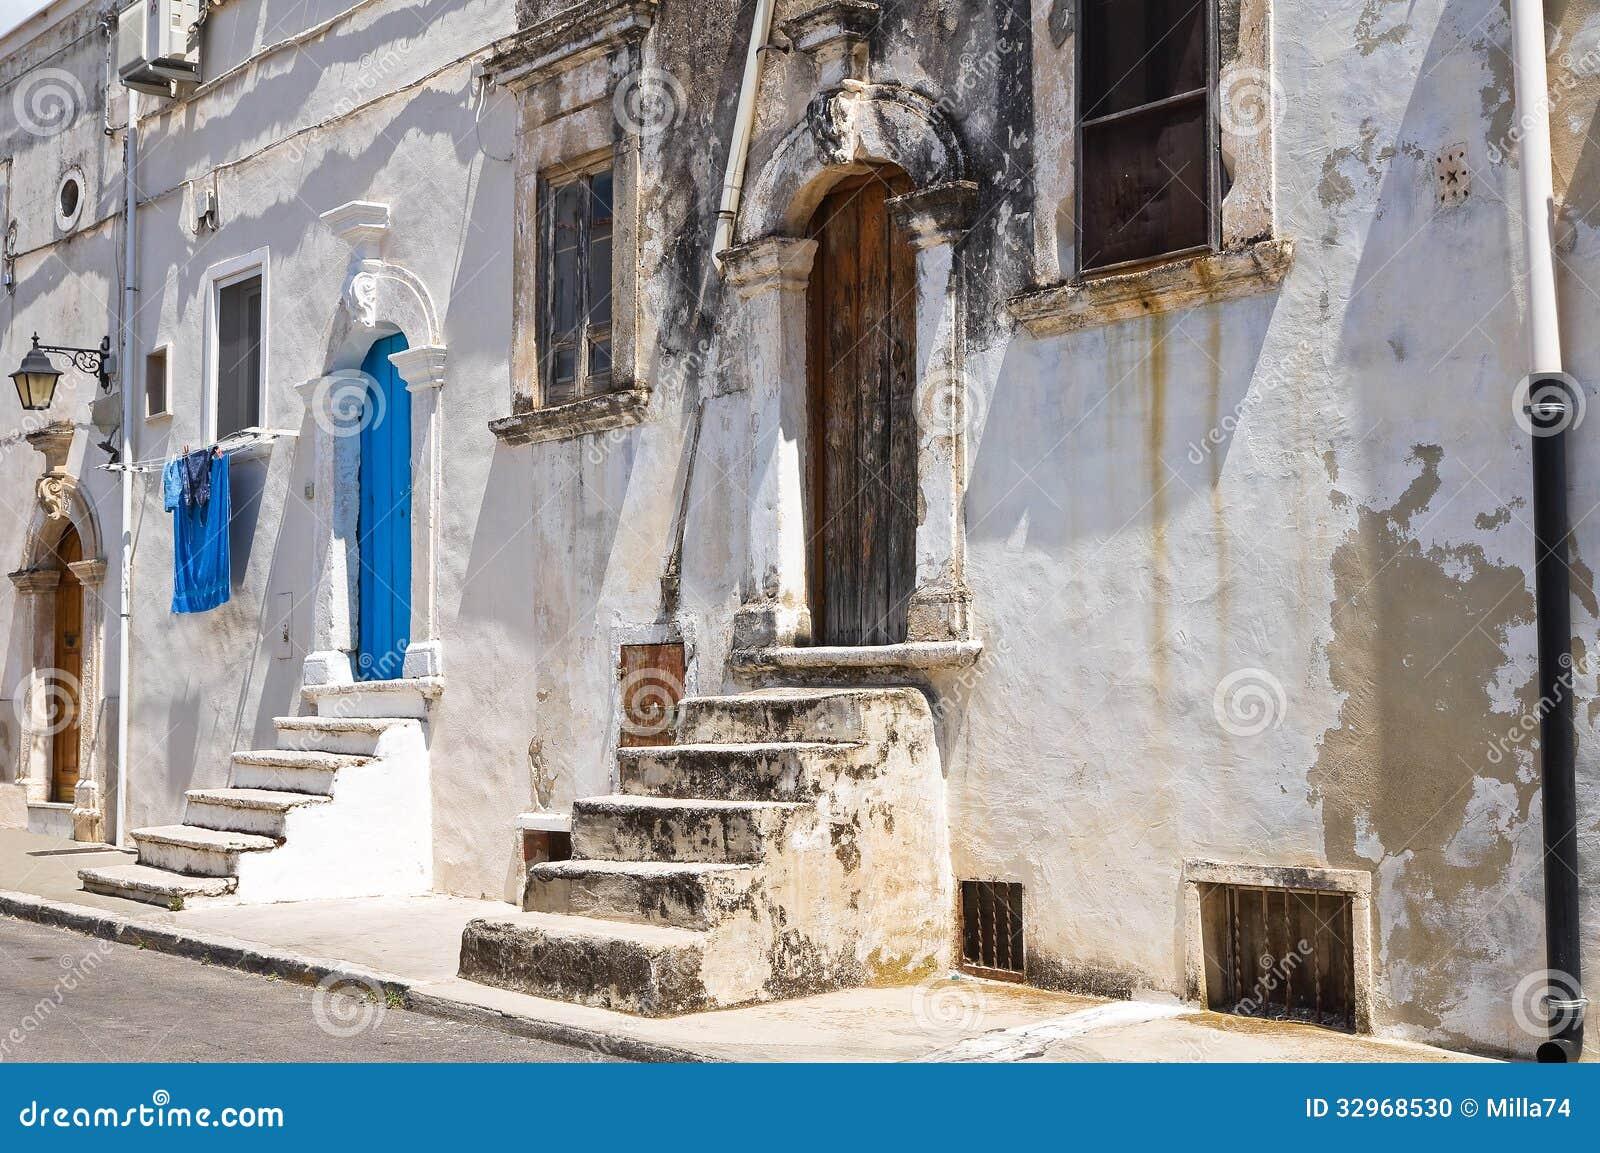 Mattinata Italy  City new picture : Alleyway. Mattinata. Puglia. Italy. Stock Photo Image: 32968530